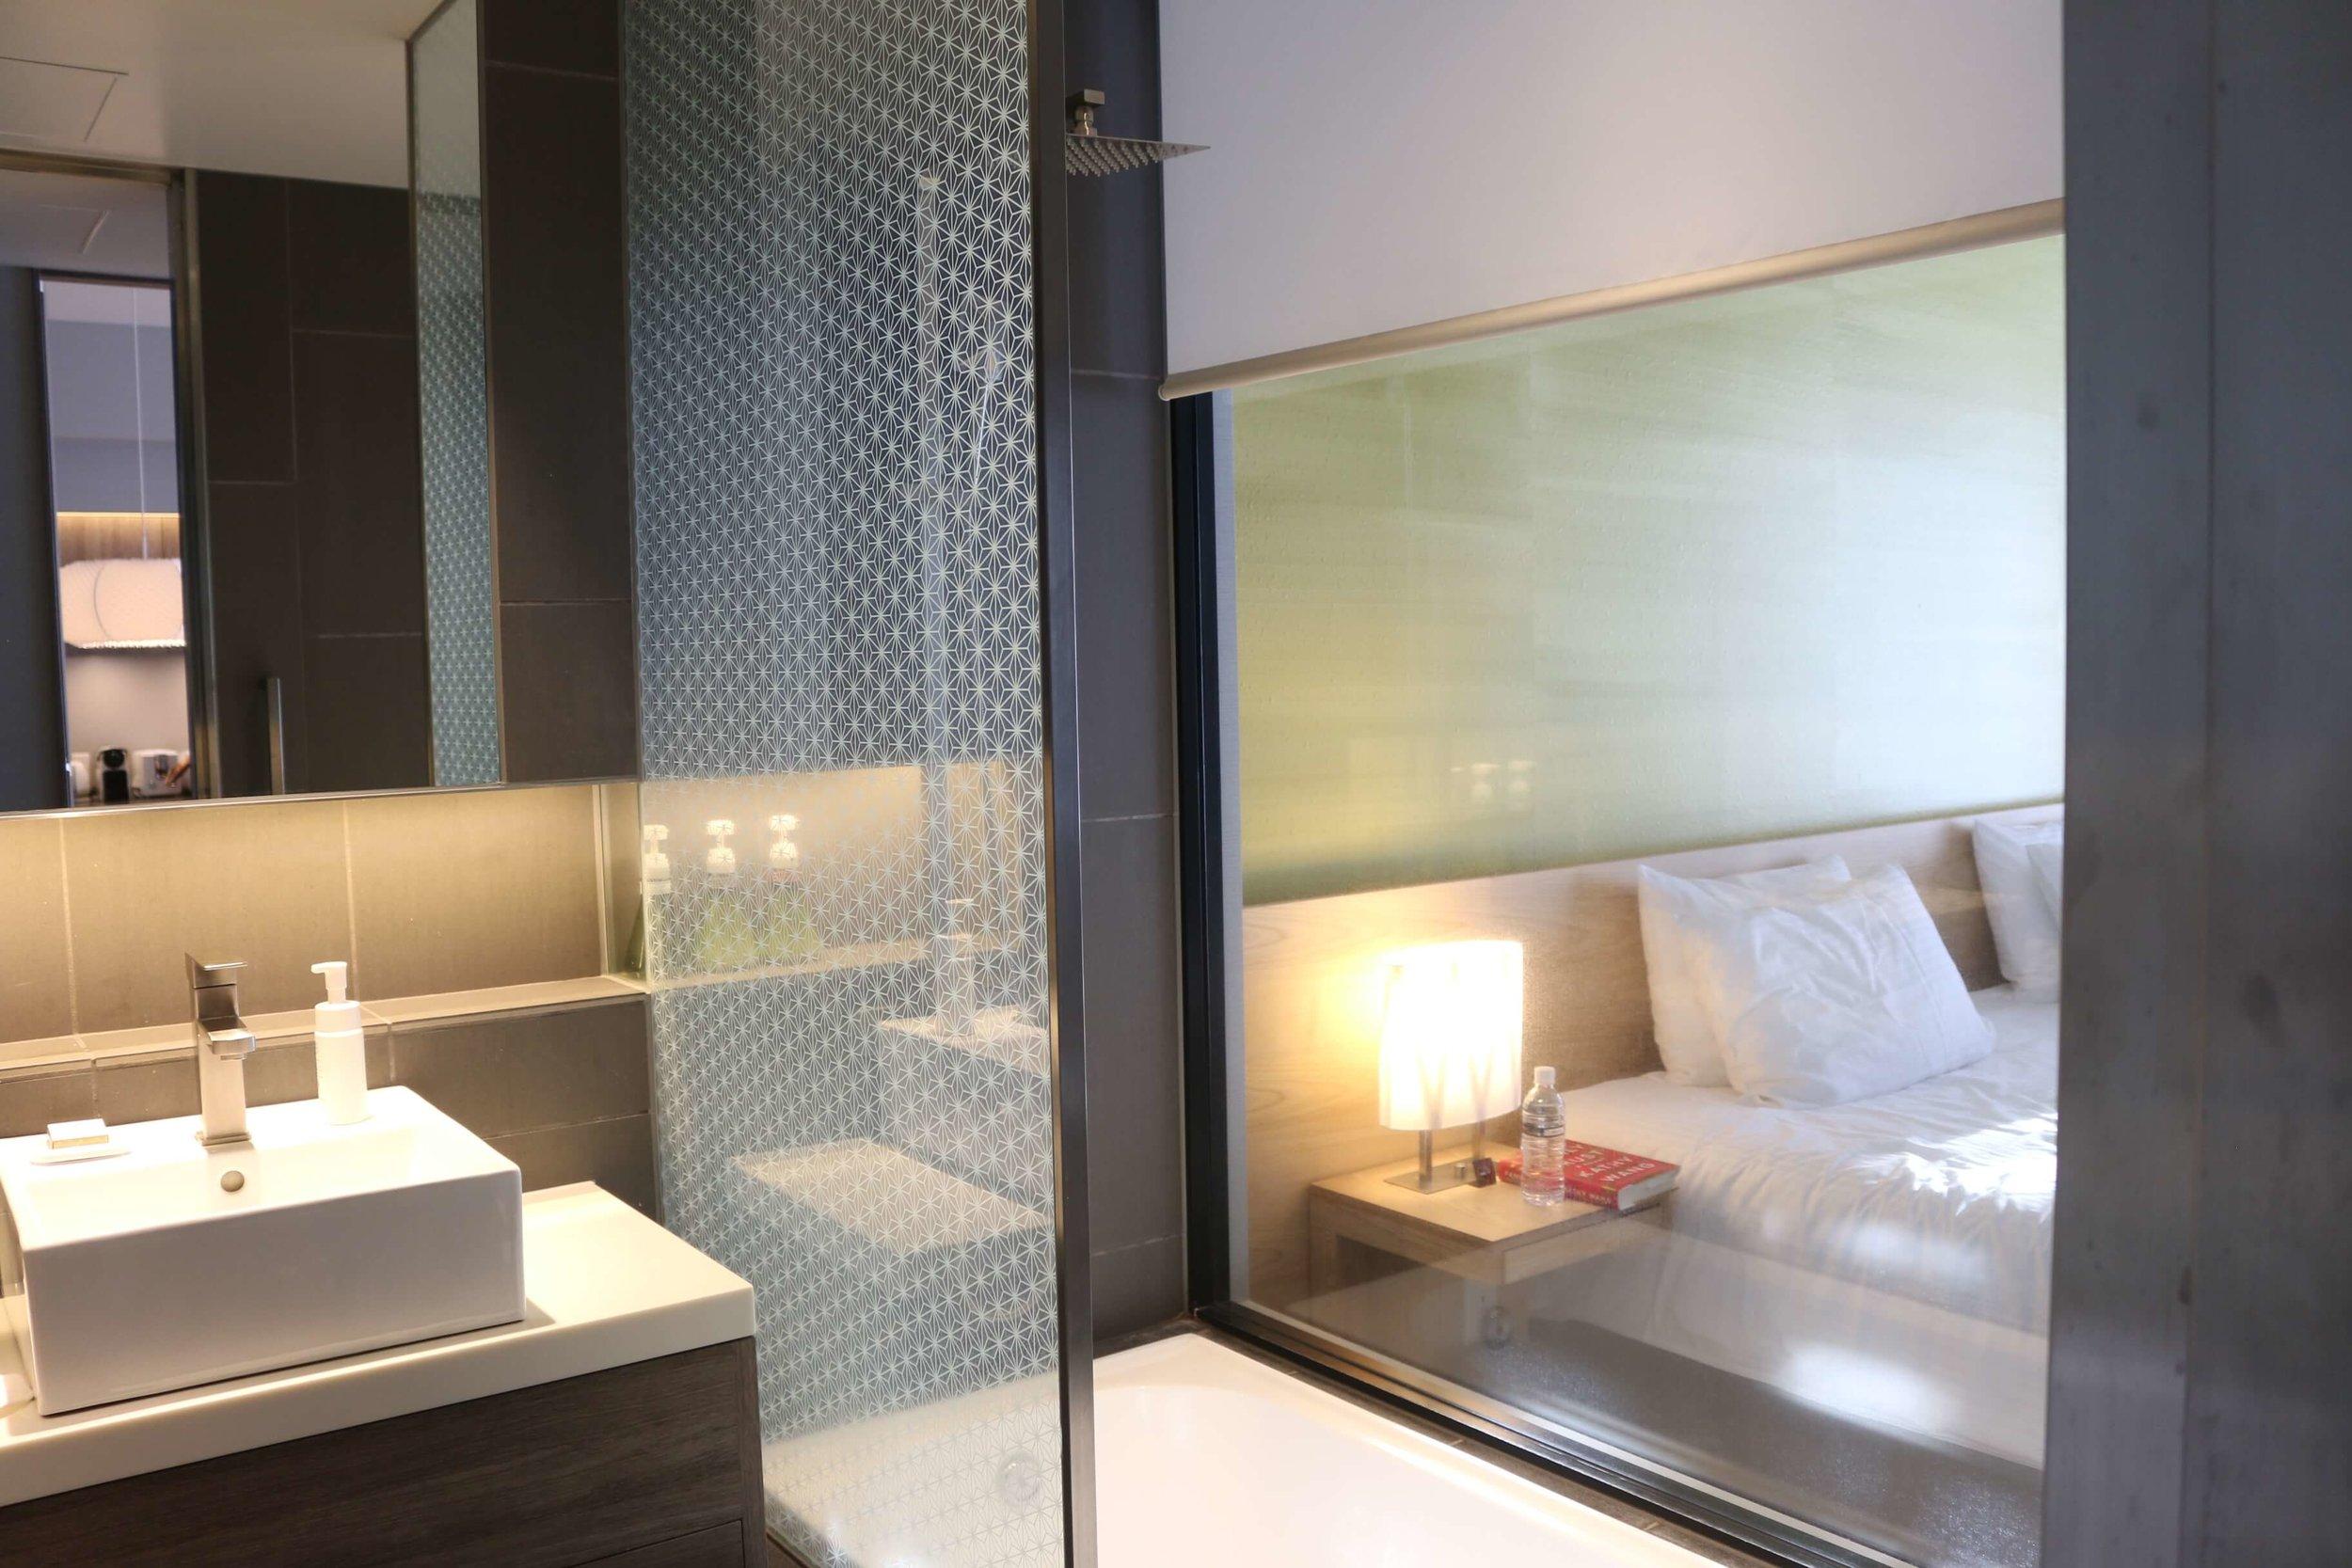 AYA Niseko luxury ski resort | where to stay in Niseko Japan | travelhappy